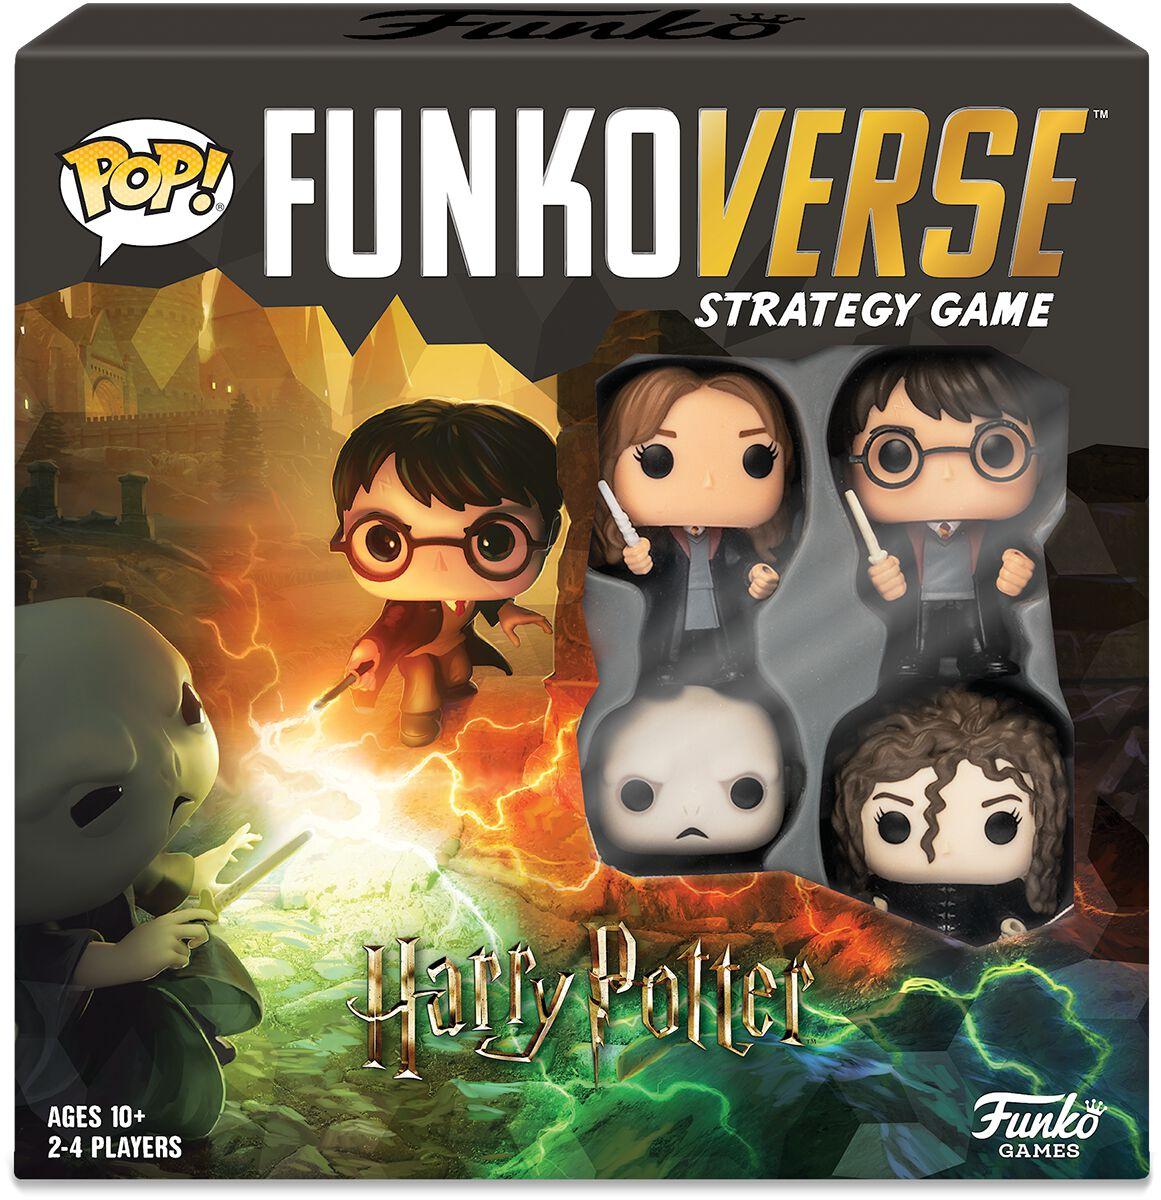 Image of Harry Potter Funkoverse 100 Englische Version Brettspiel Standard